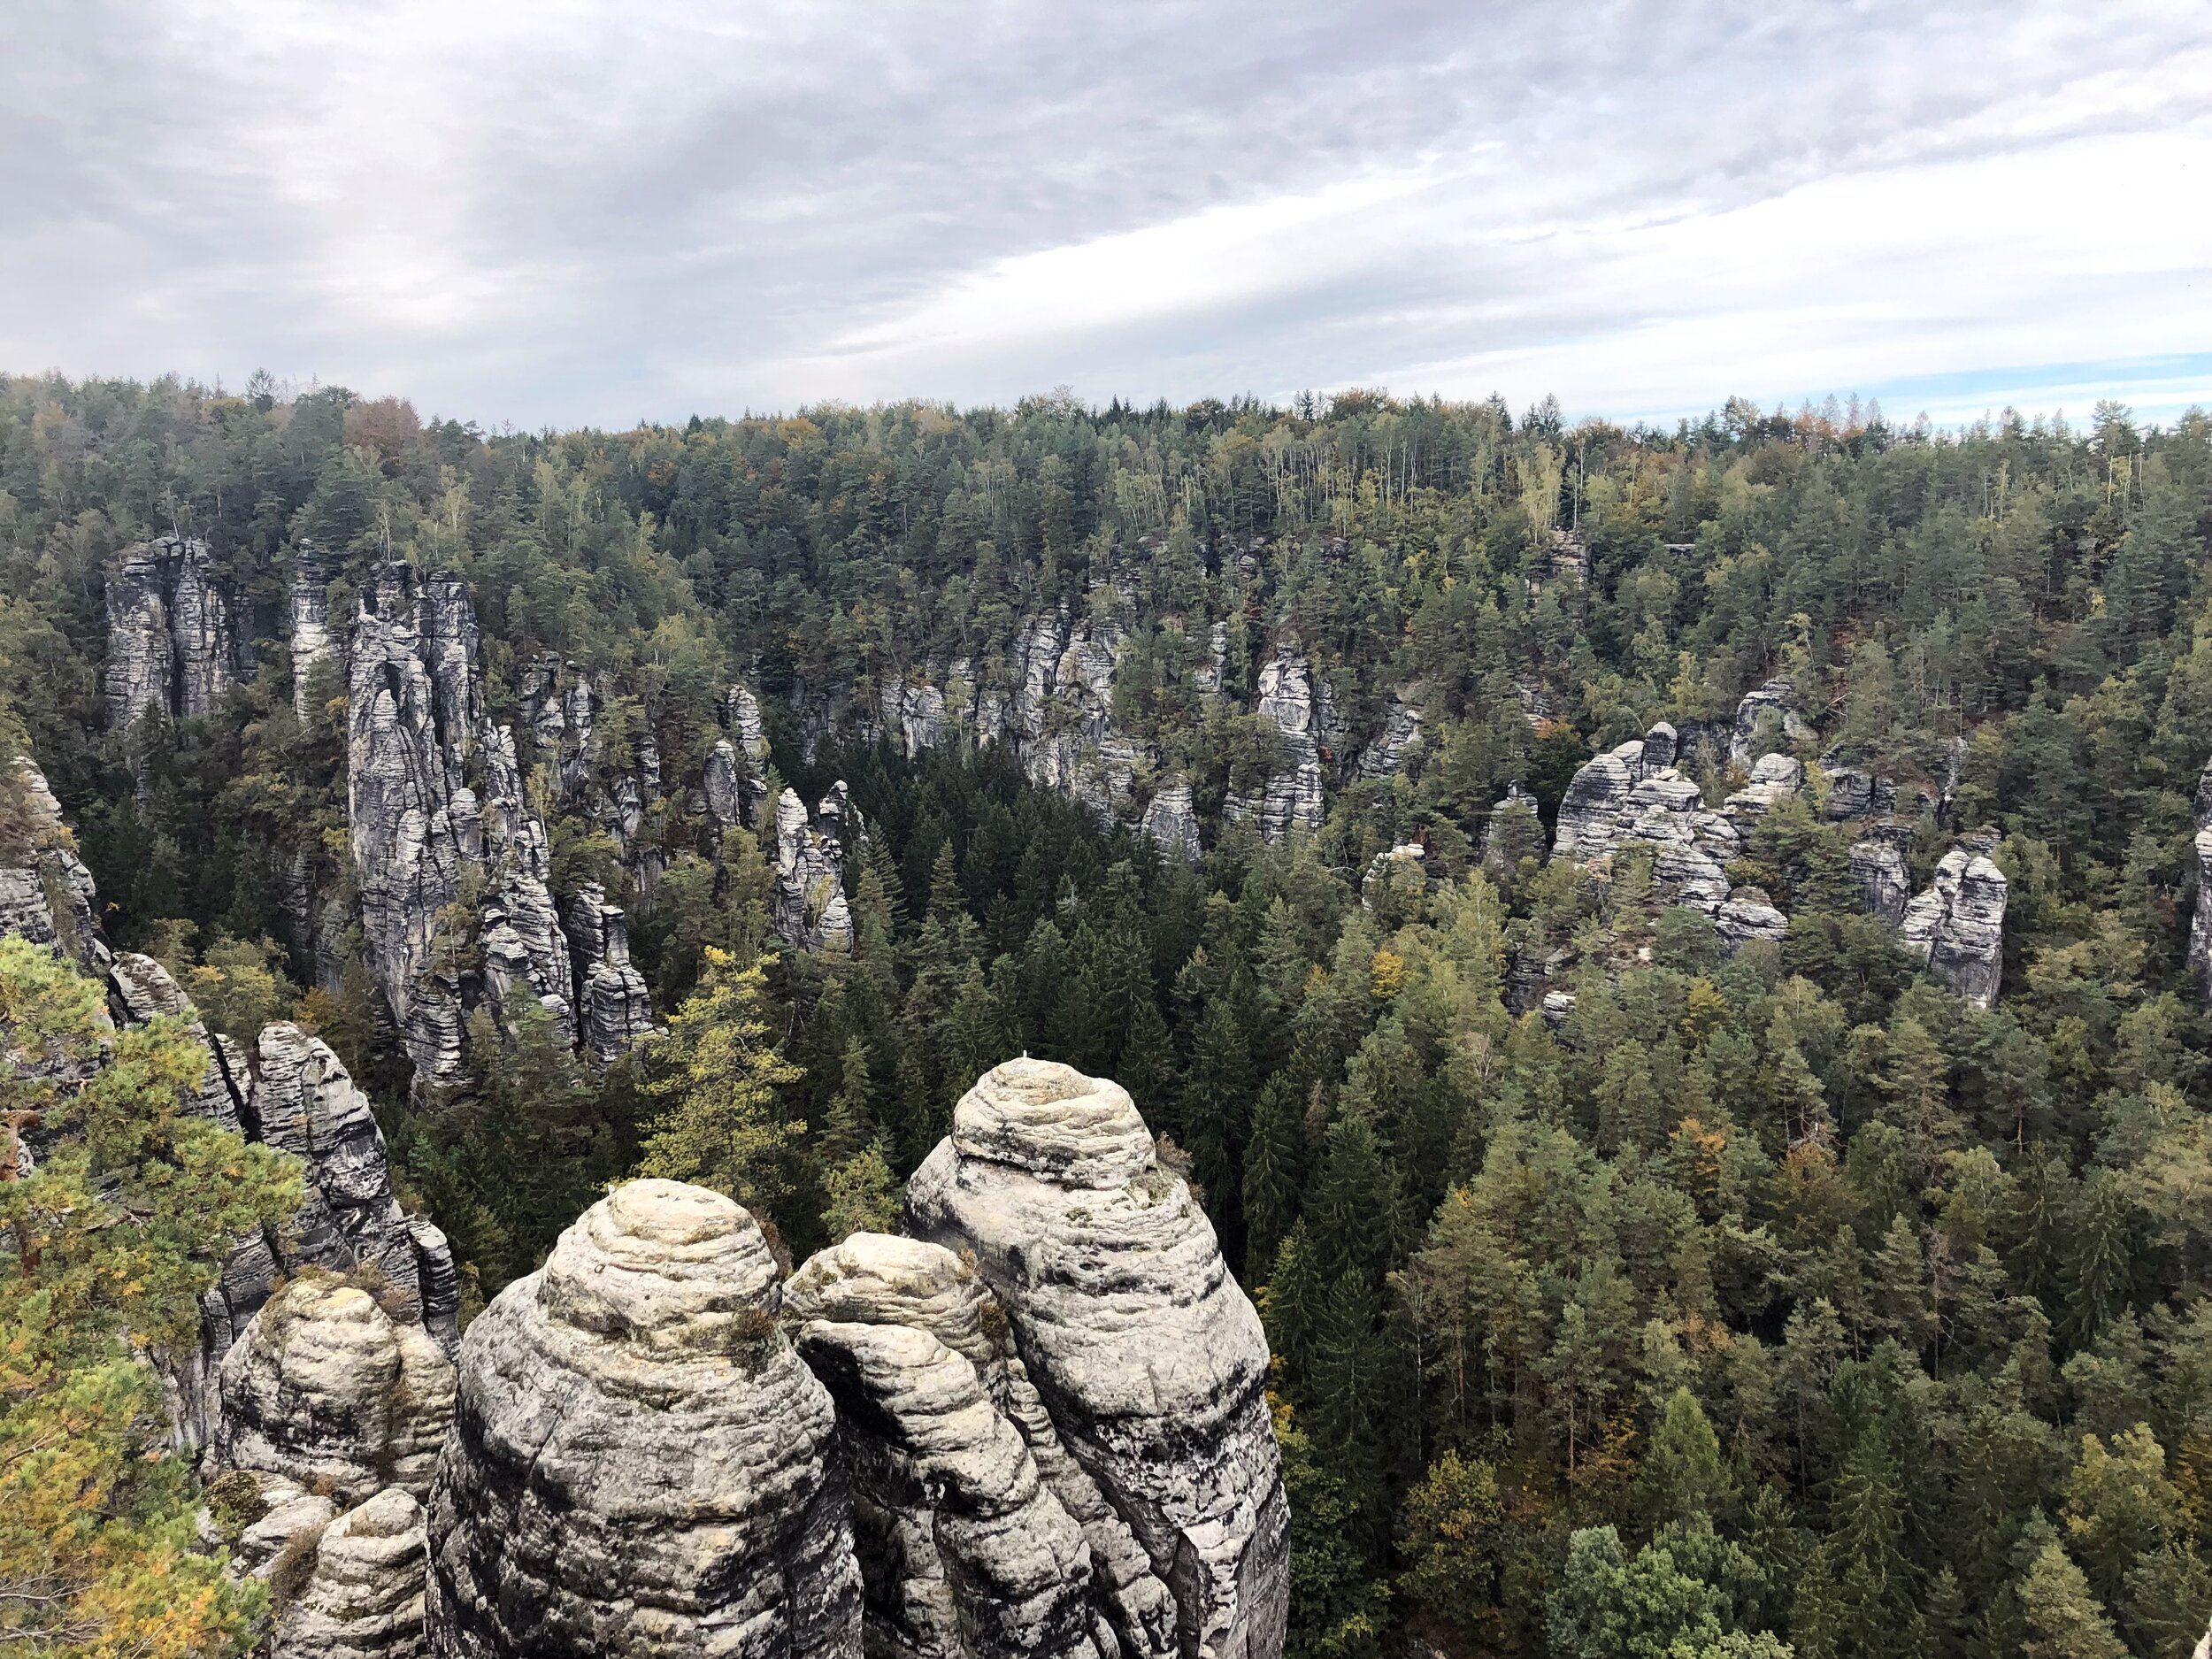 baste-bridge-lohmen-germany-hiking_0307.JPG